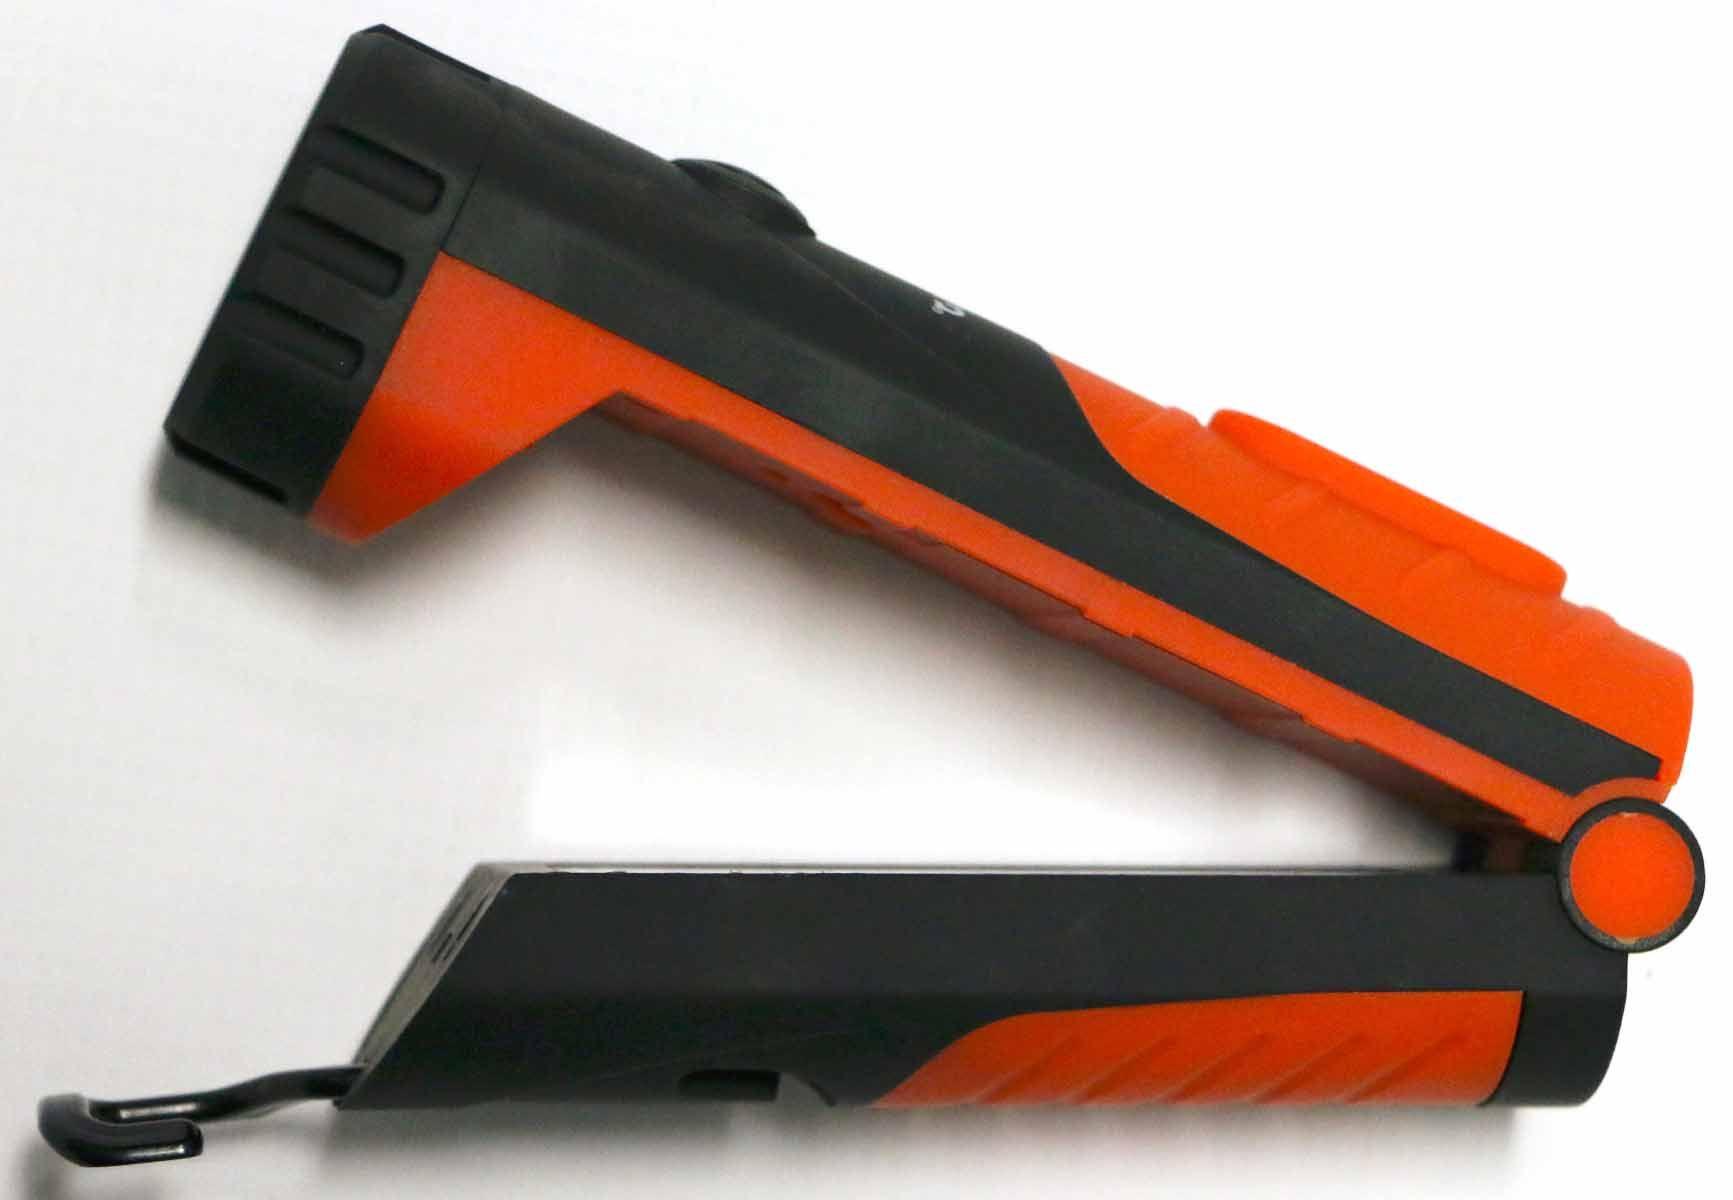 Kubota handheld flashlight / worklight Model #7770008994